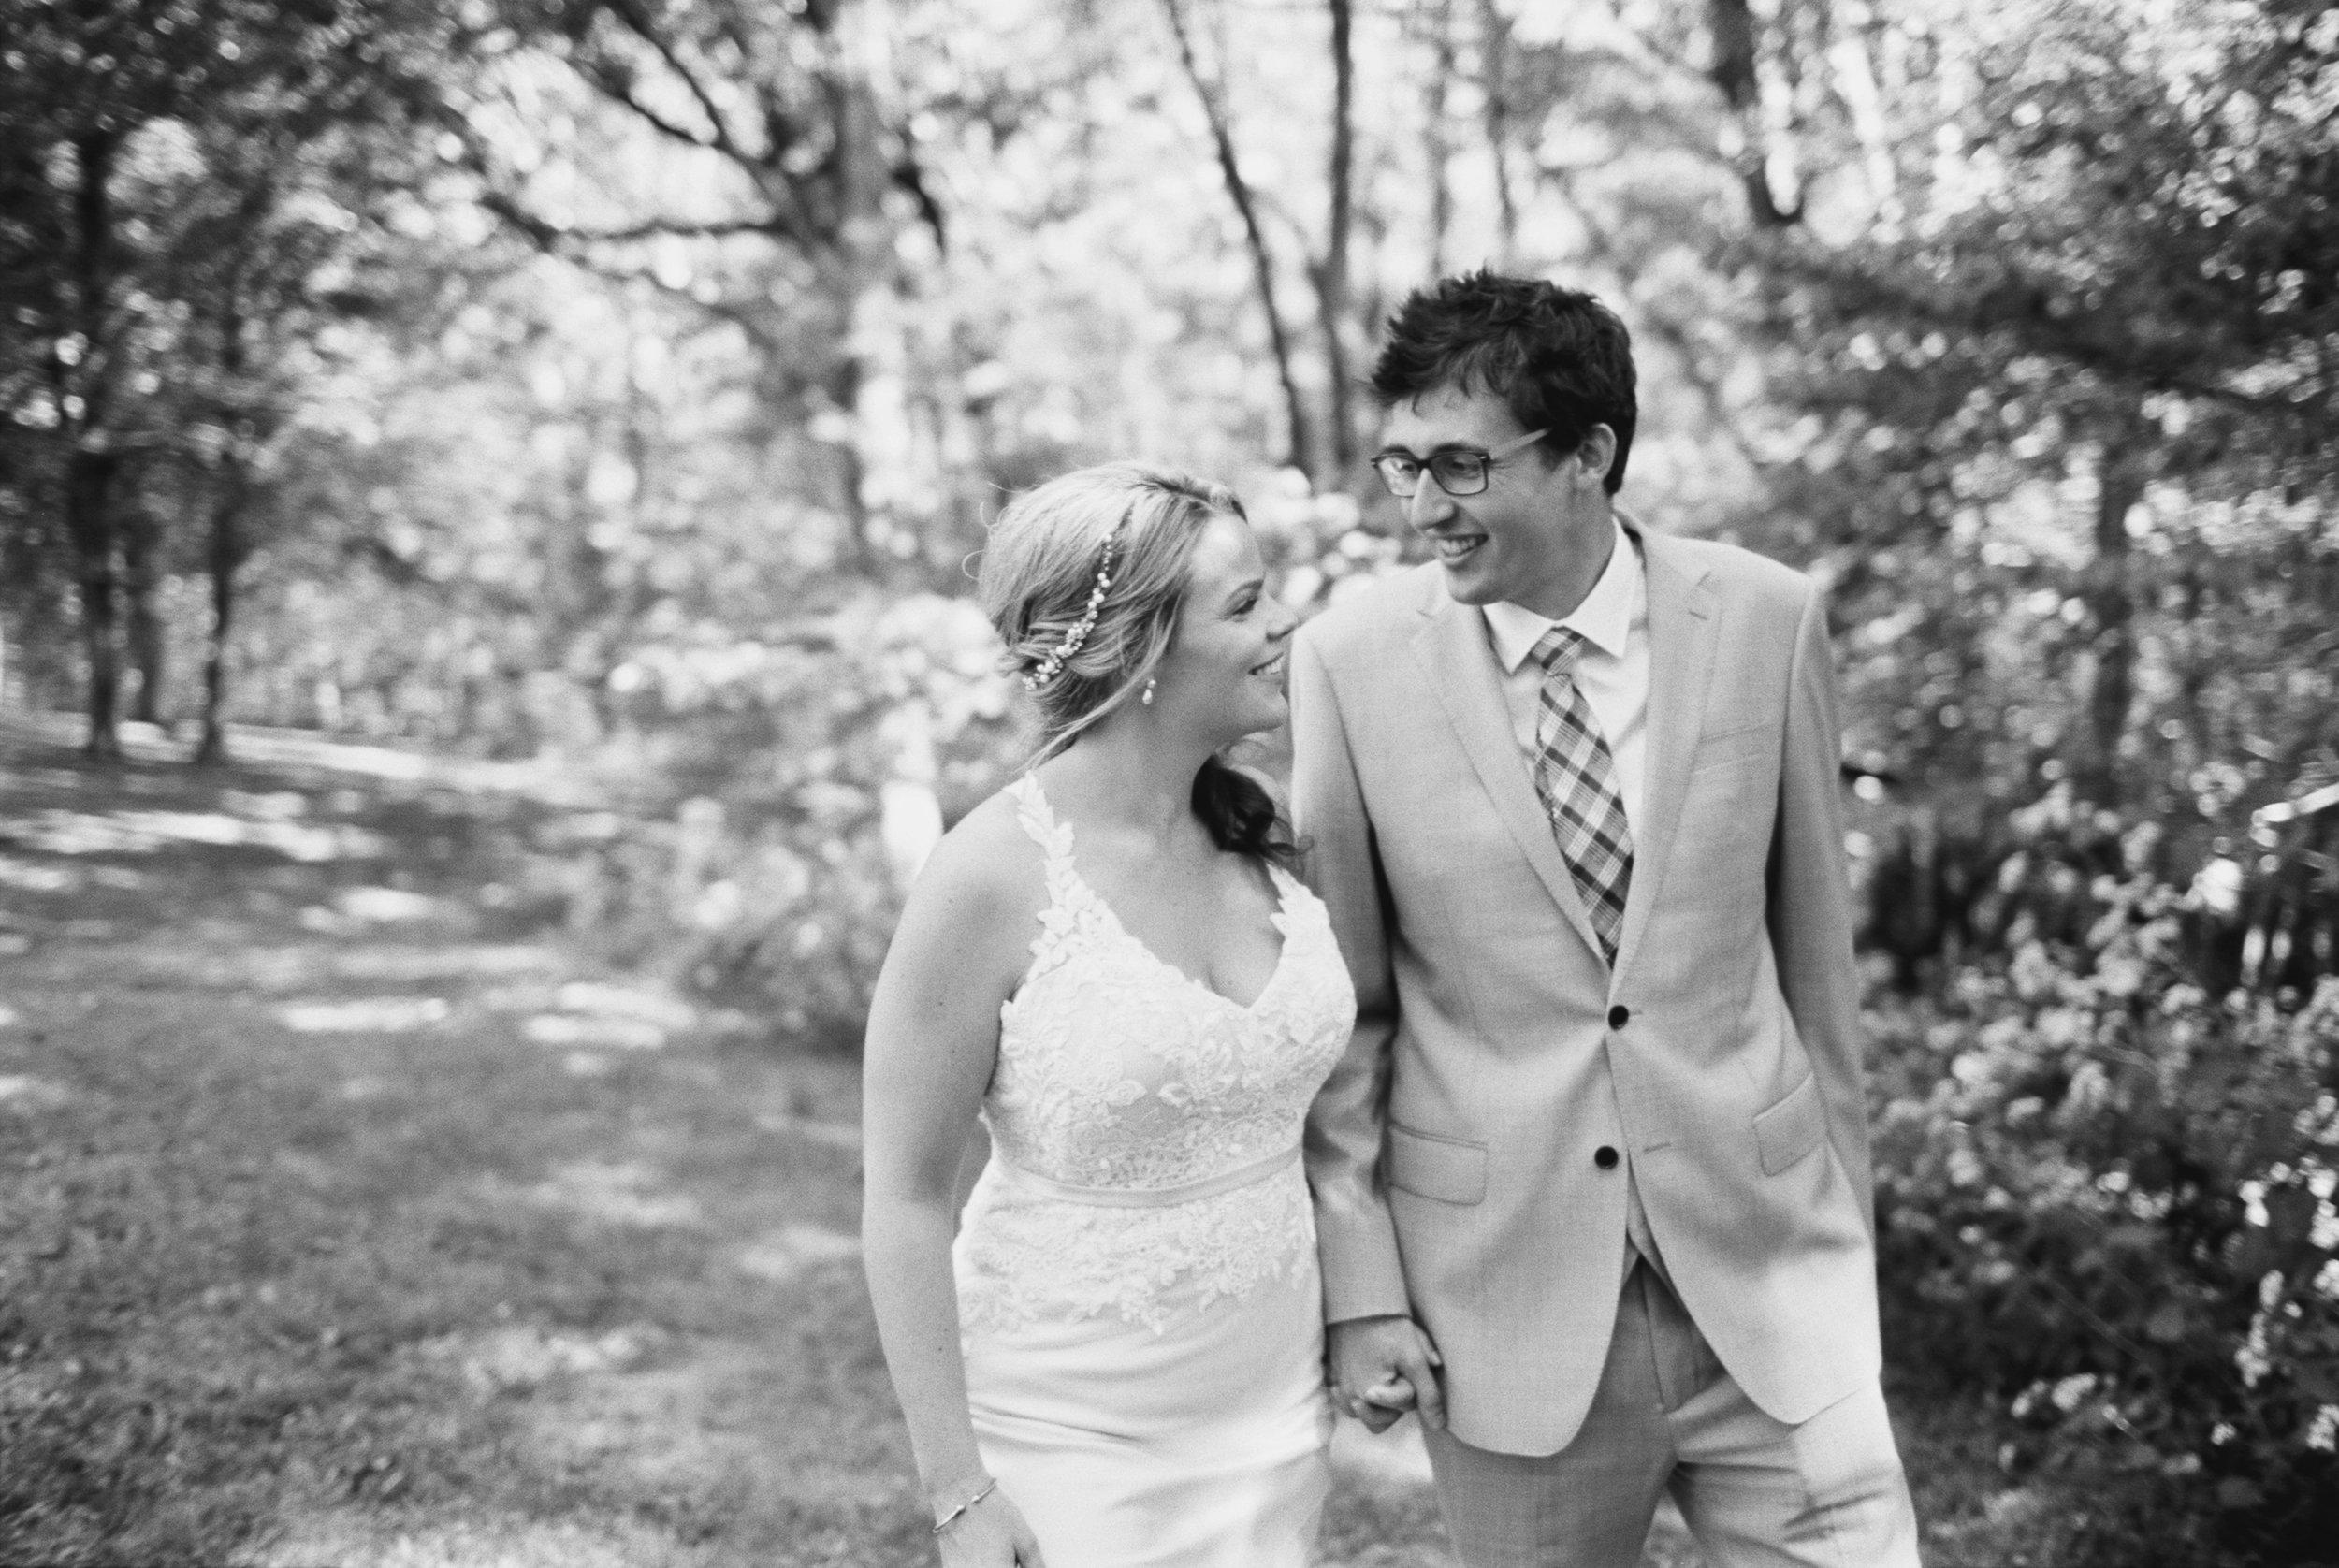 Abby_Simon_Wedding_Abigail_Malone_Photography_nashville_Bloomsbury_Farm-135.jpg